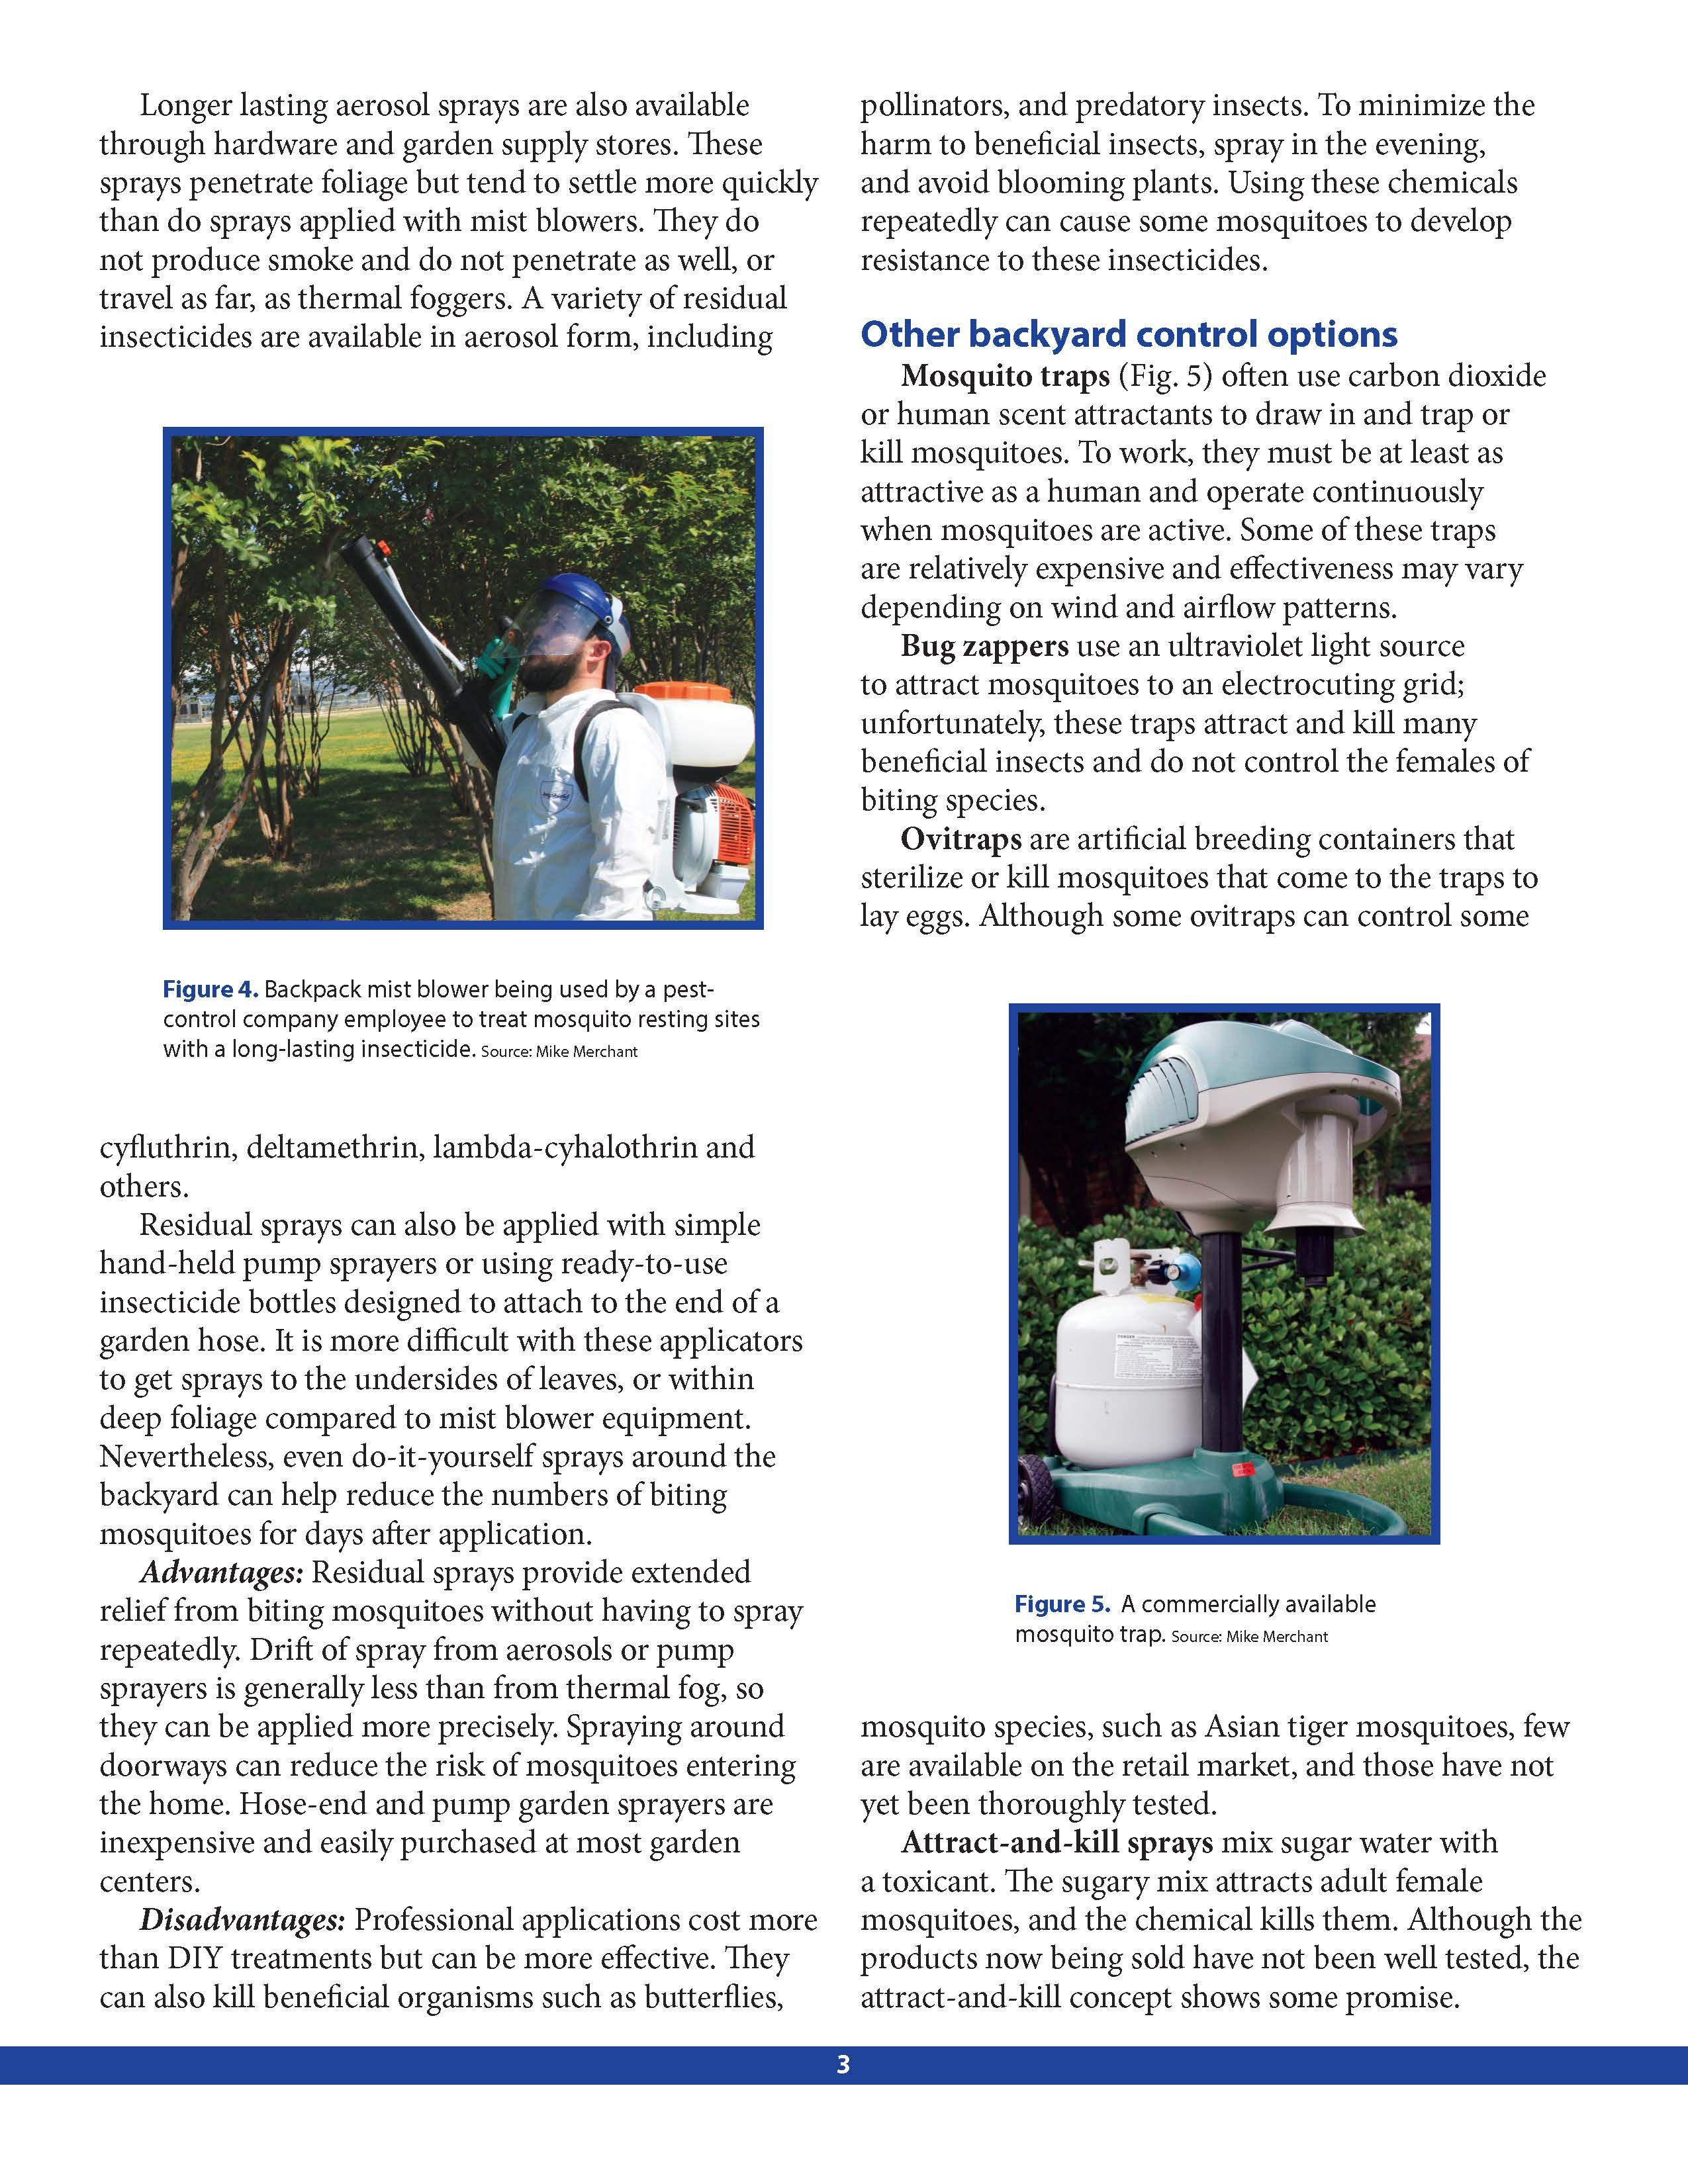 diy backyard mosquito control page 3 by texas a u0026m agrilife